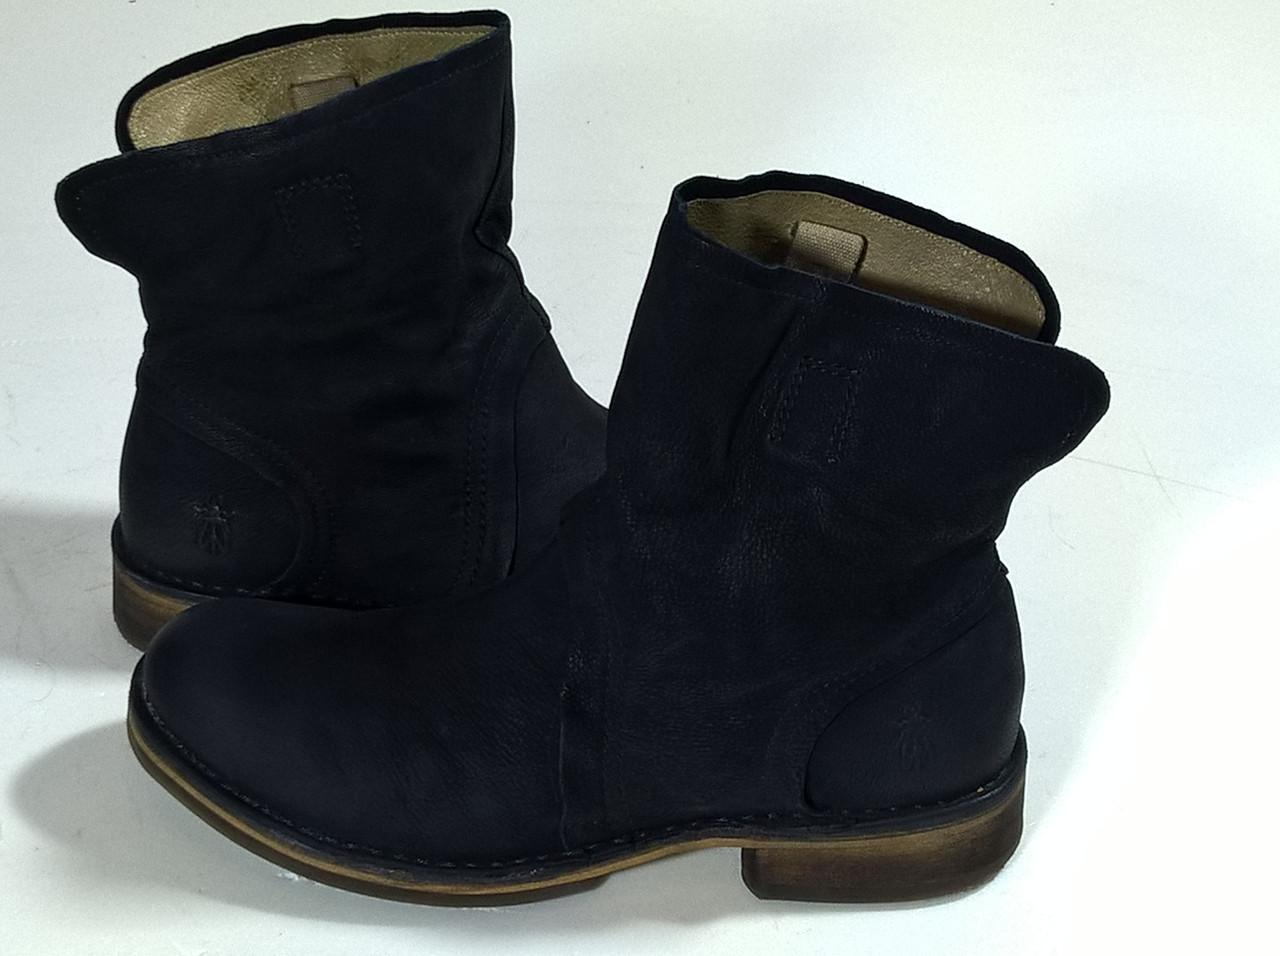 Ботинки,  сапоги женские 40 размер бренд FLY ( Португалия)